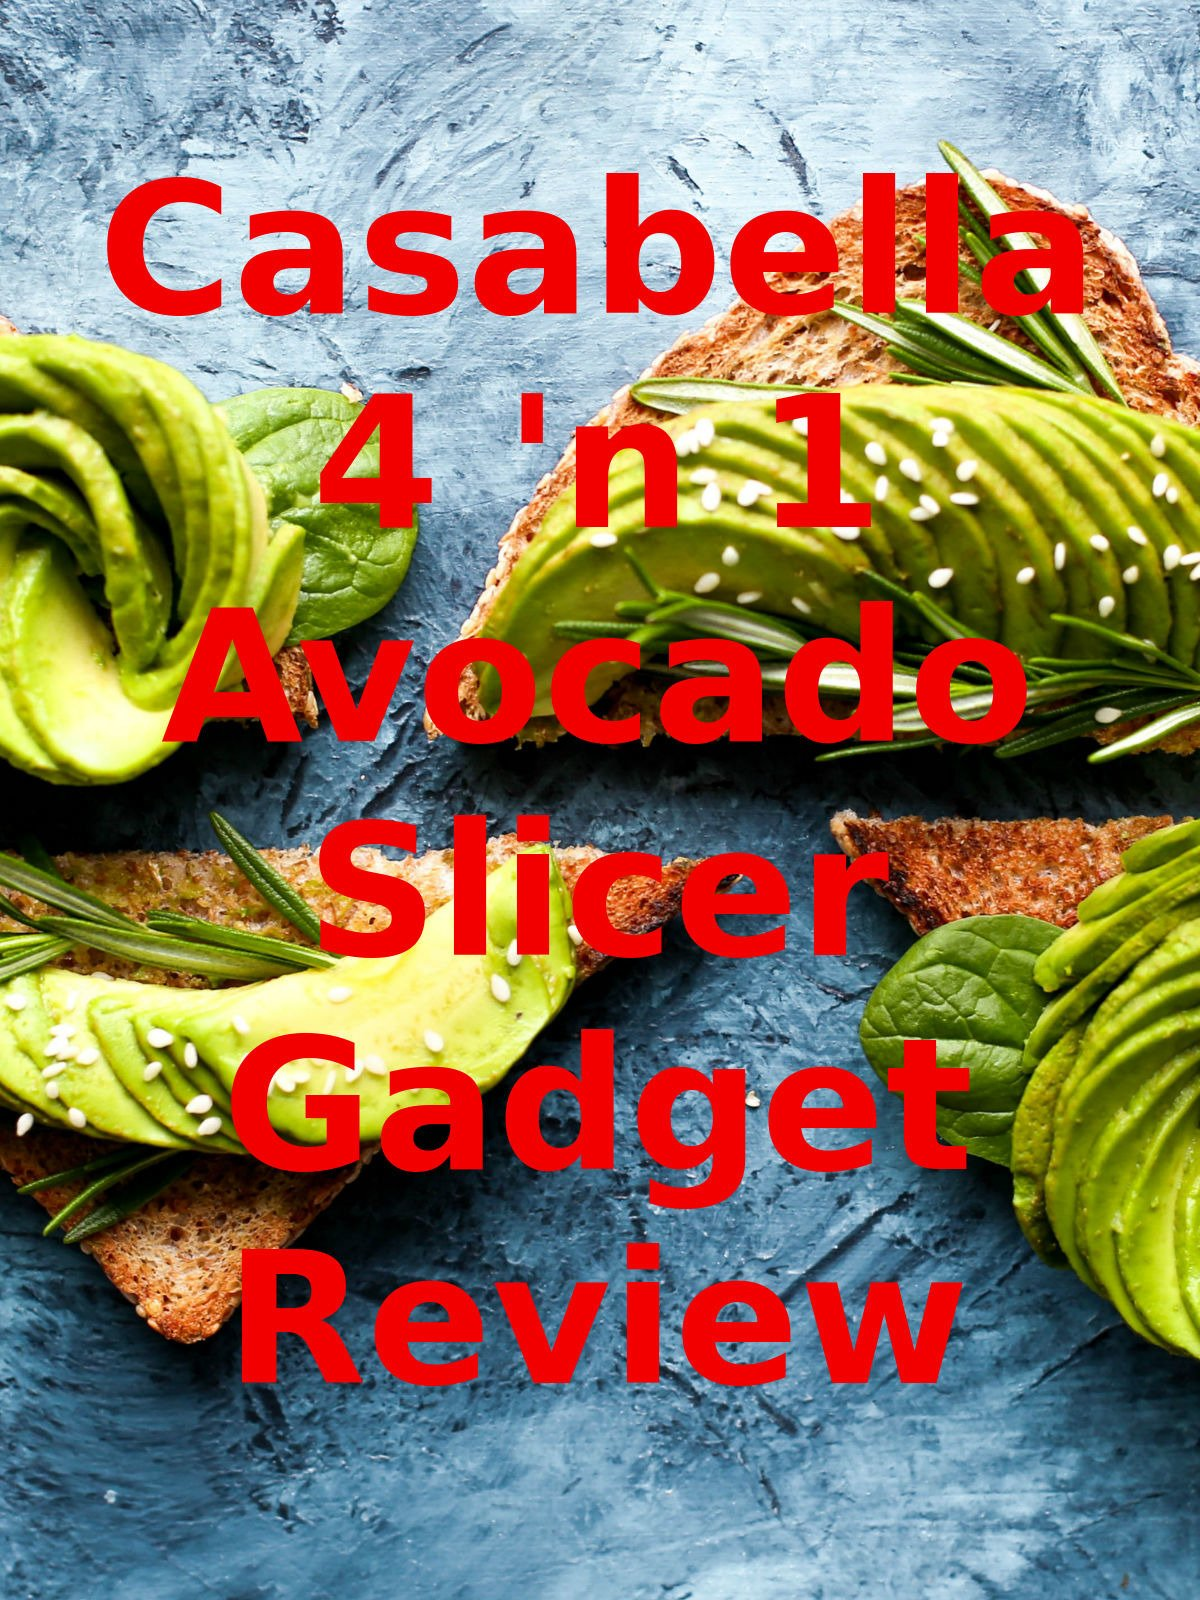 Review: Casabella 4 'n 1 Avocado Slicer Gadget Review